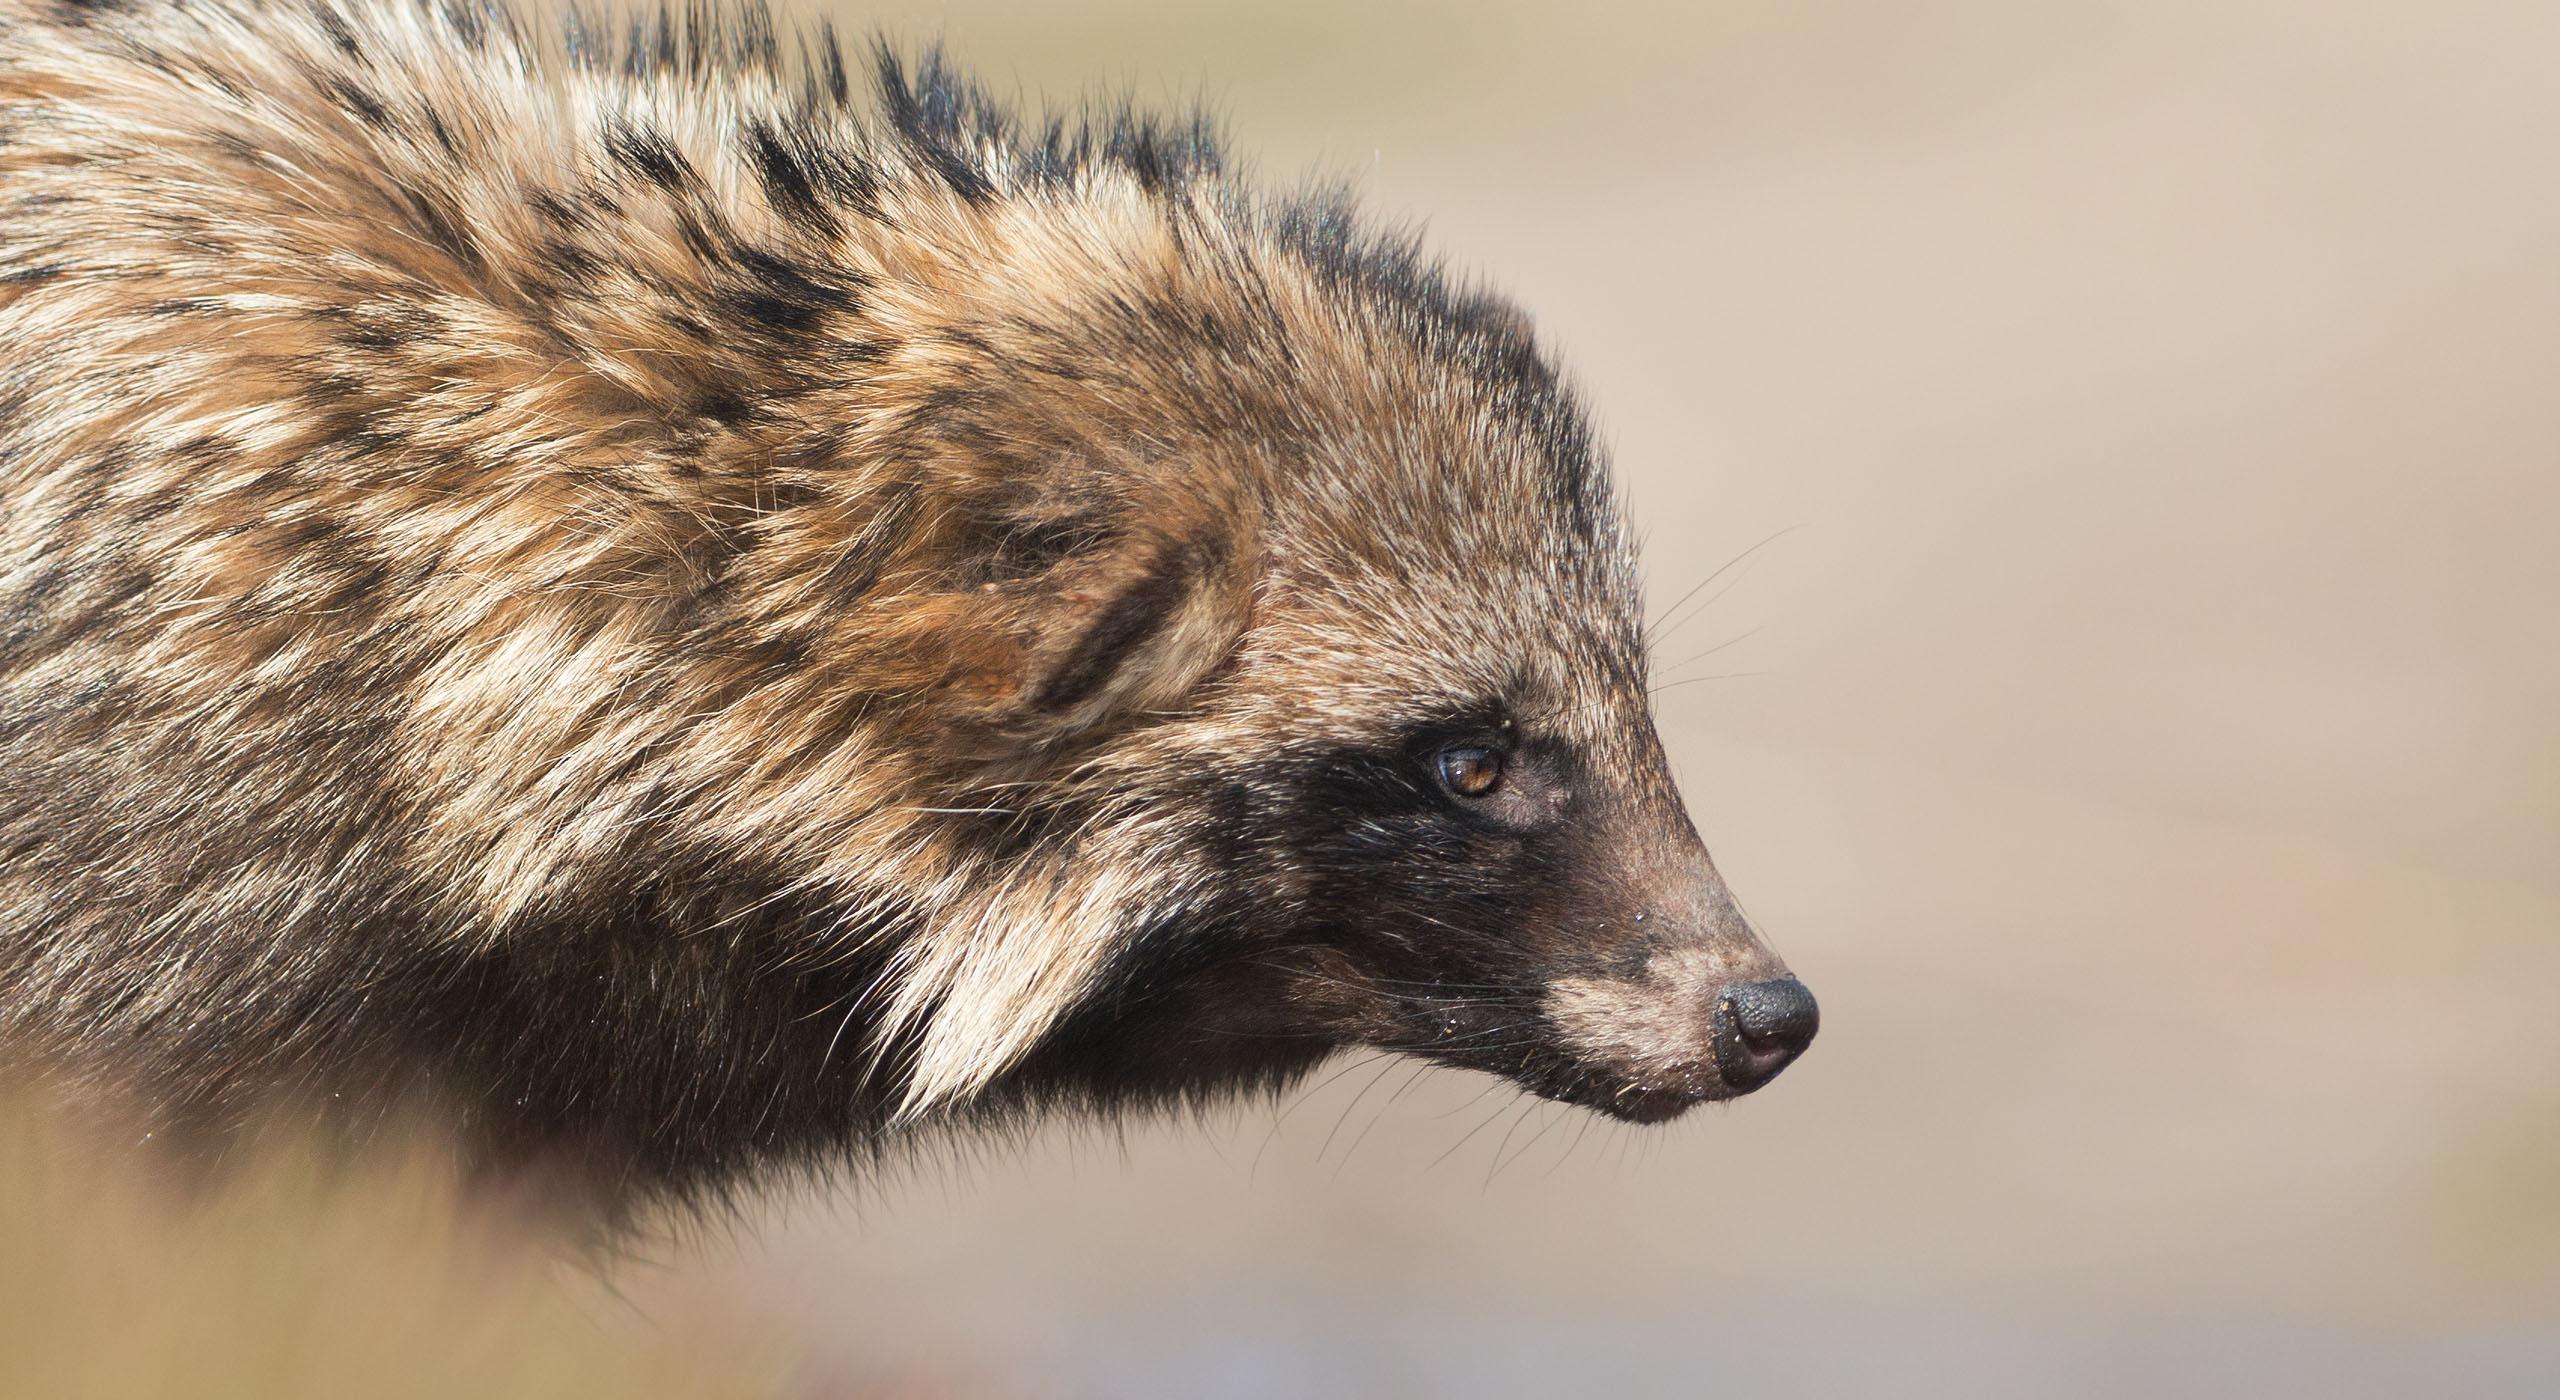 Raccoon dog portrait wast taken on Kinburn